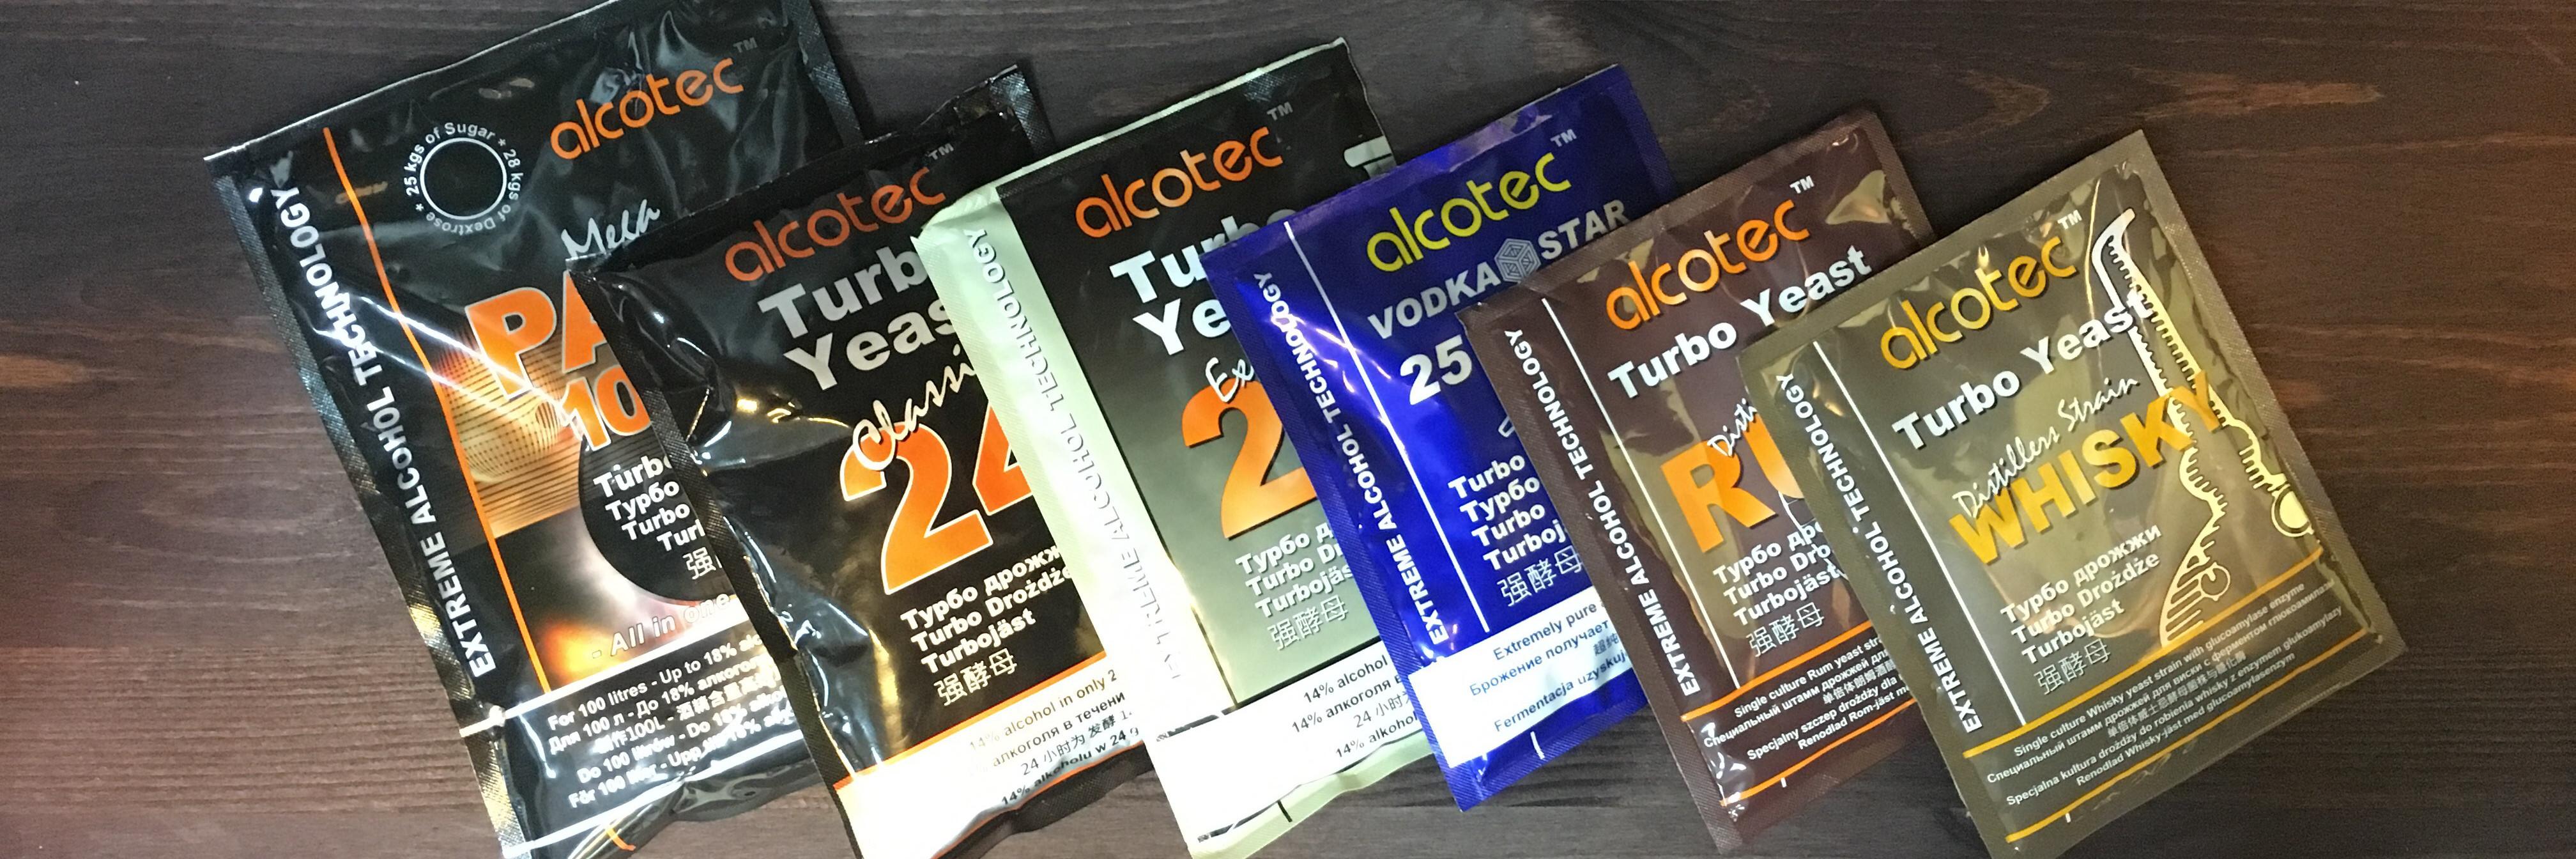 Турбо дрожжи от компании Alcotec